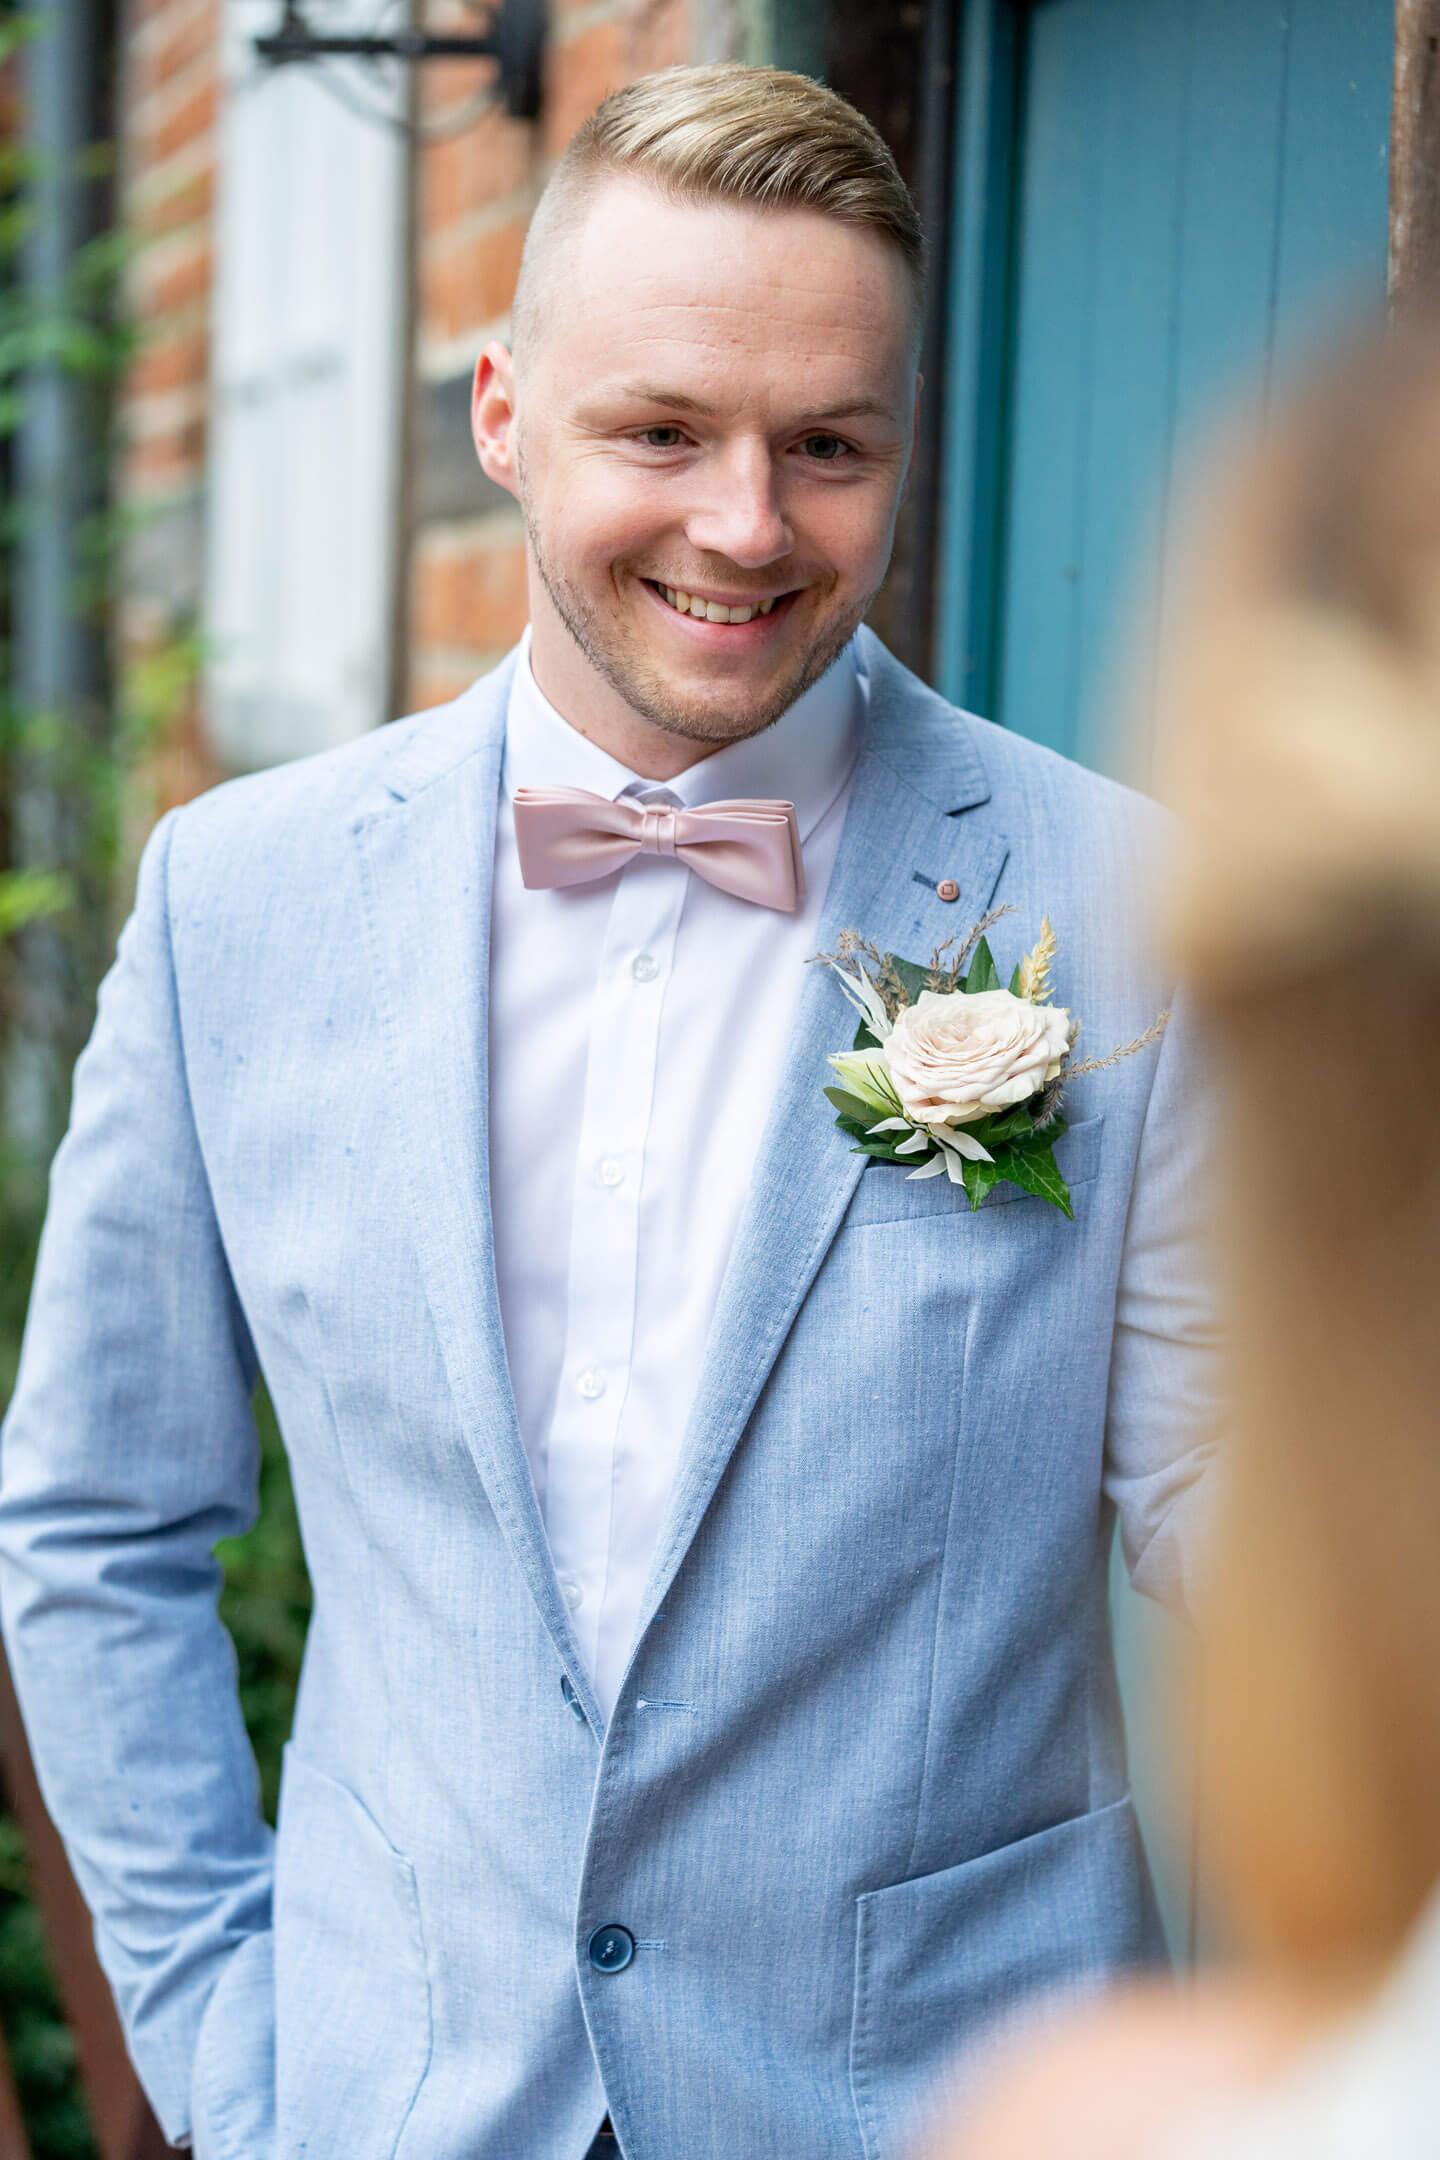 Bräutigam lächelt seine Braut an.